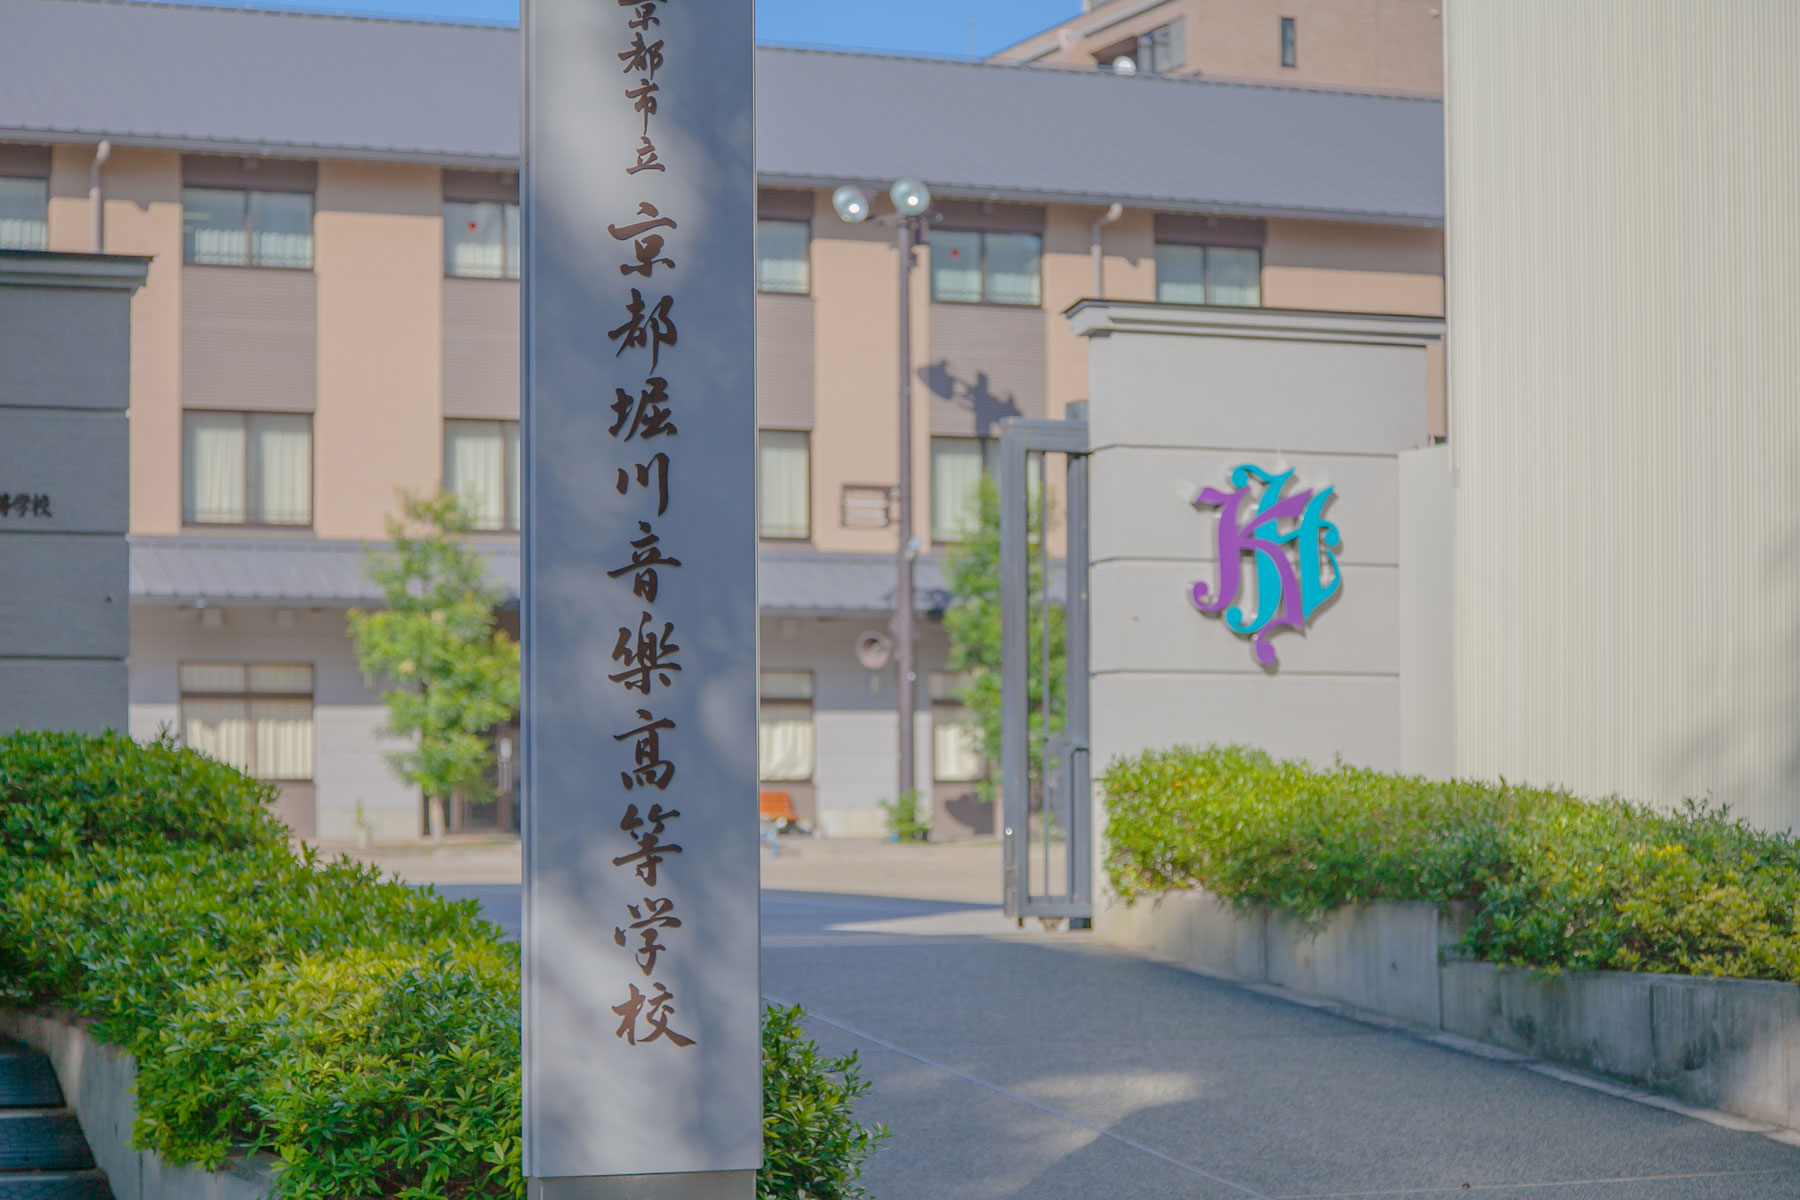 京都堀川音楽高校 正門 の画像